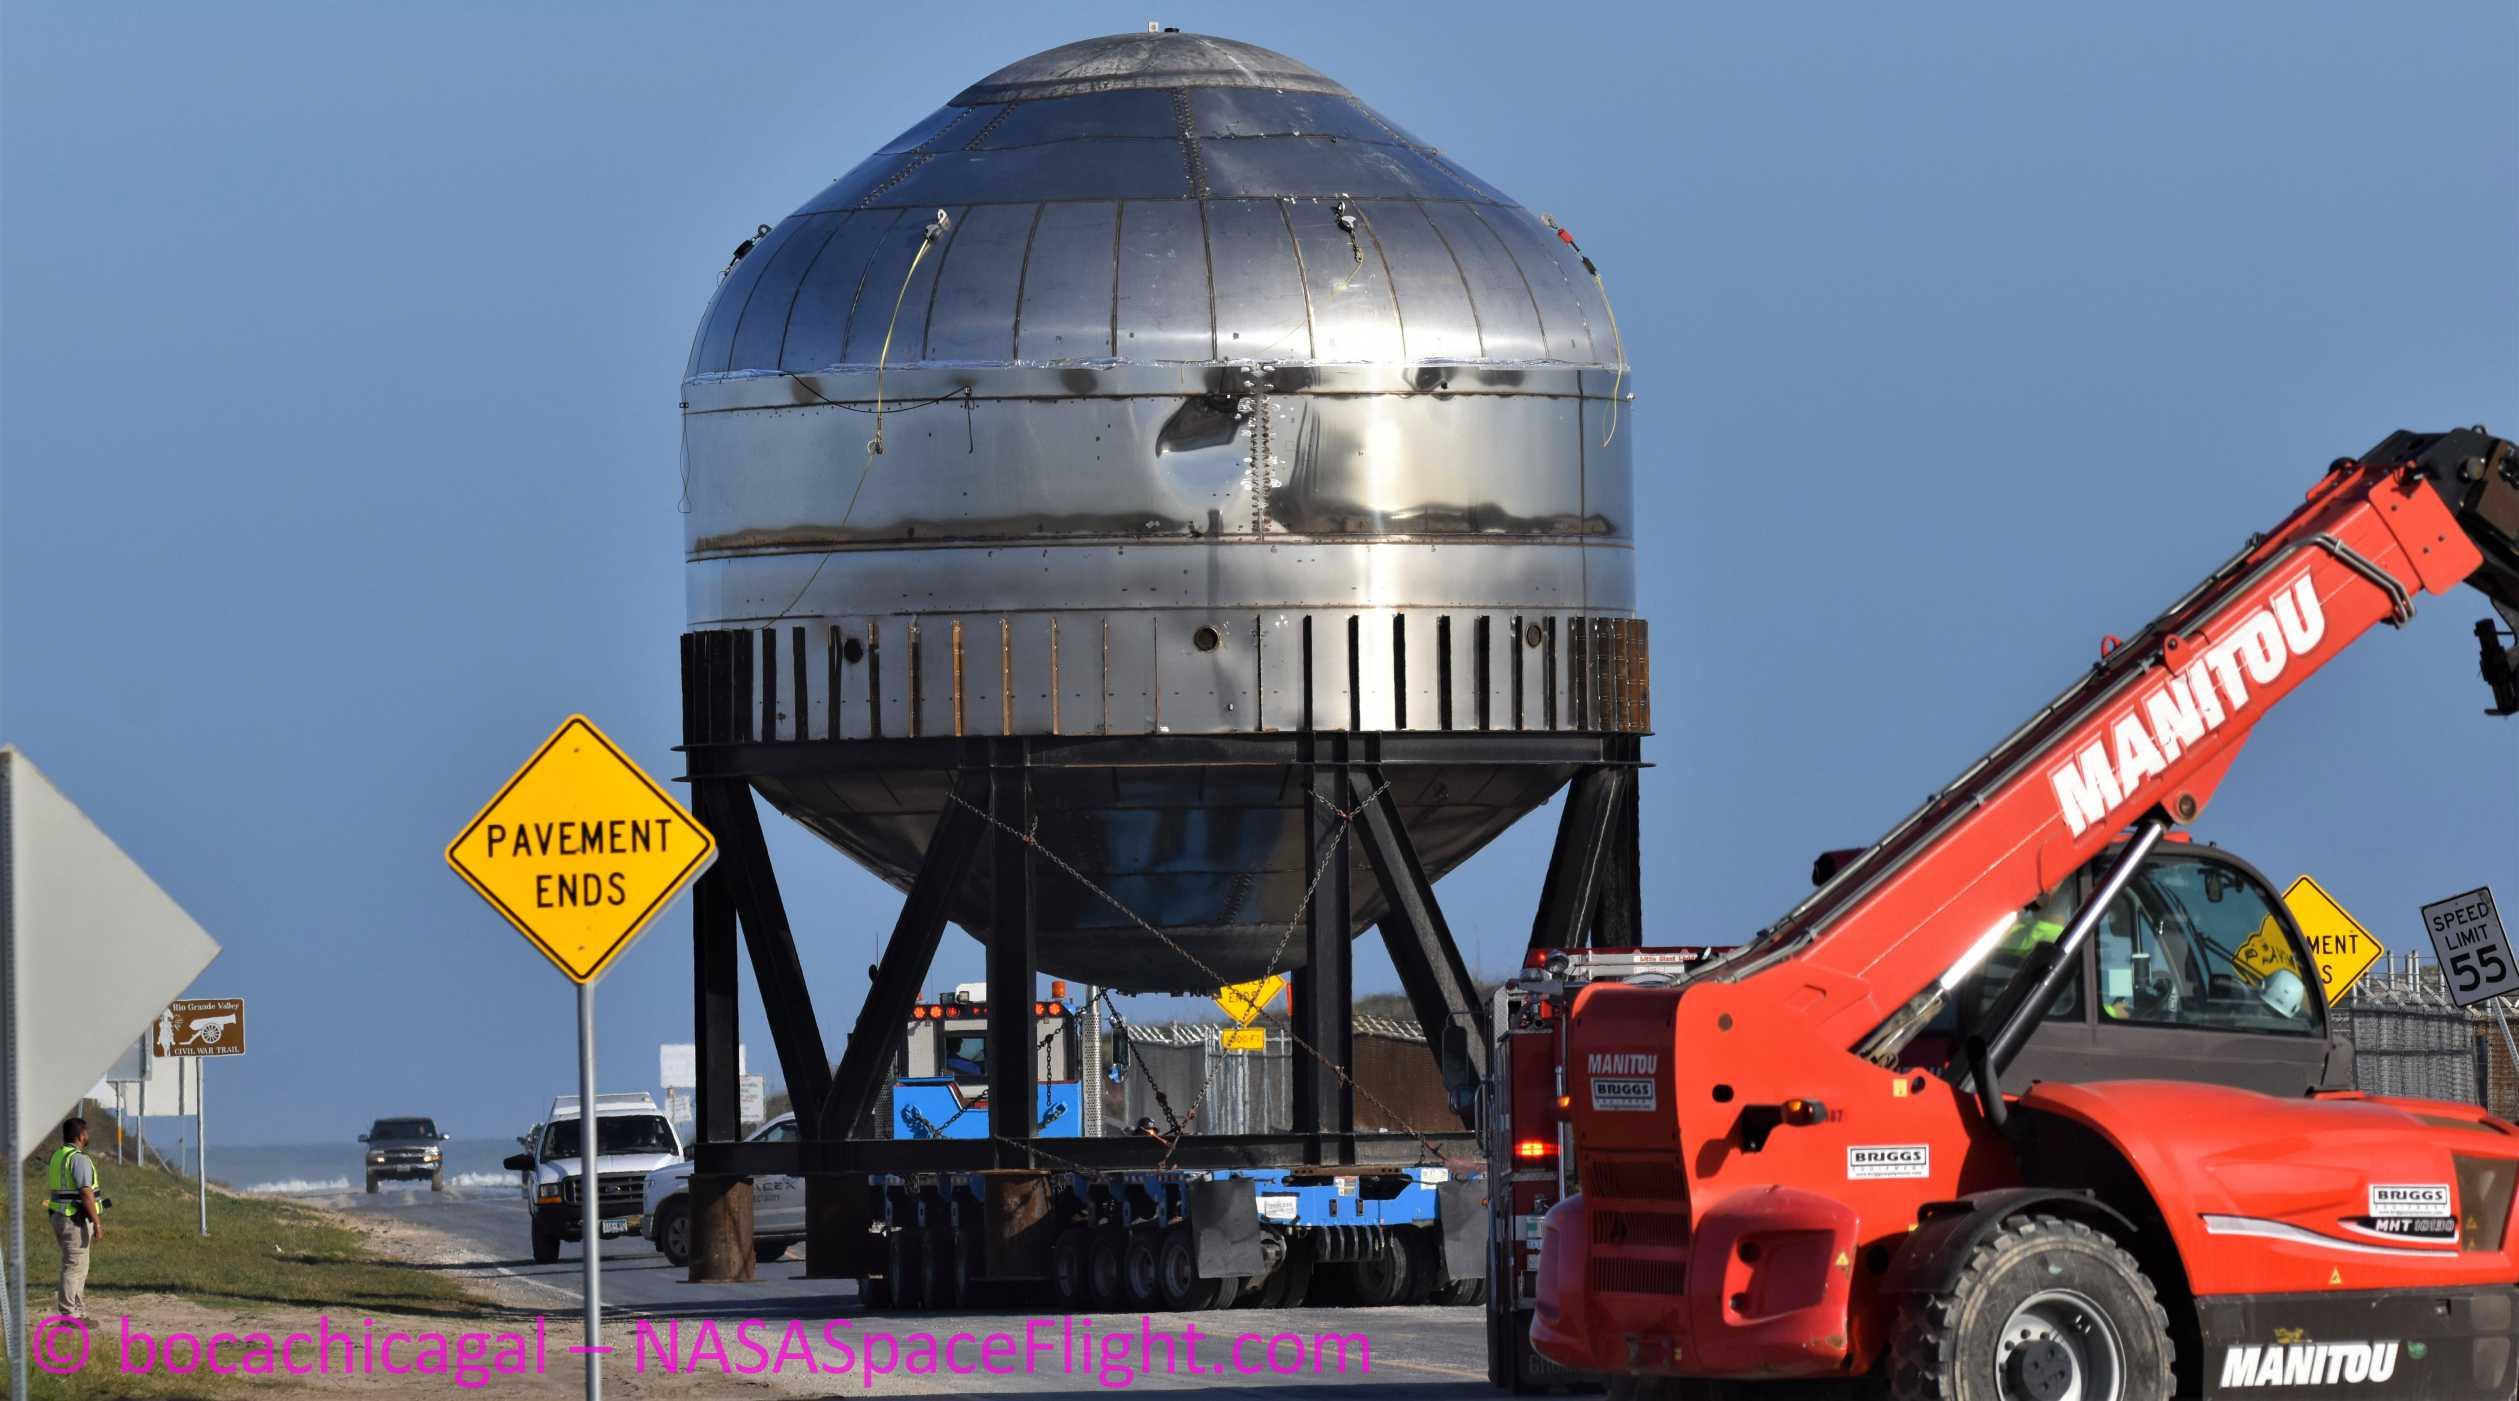 Starship Boca Chica 010920 (NASASpaceflight – bocachicagal) test tank transport 6 crop (c)